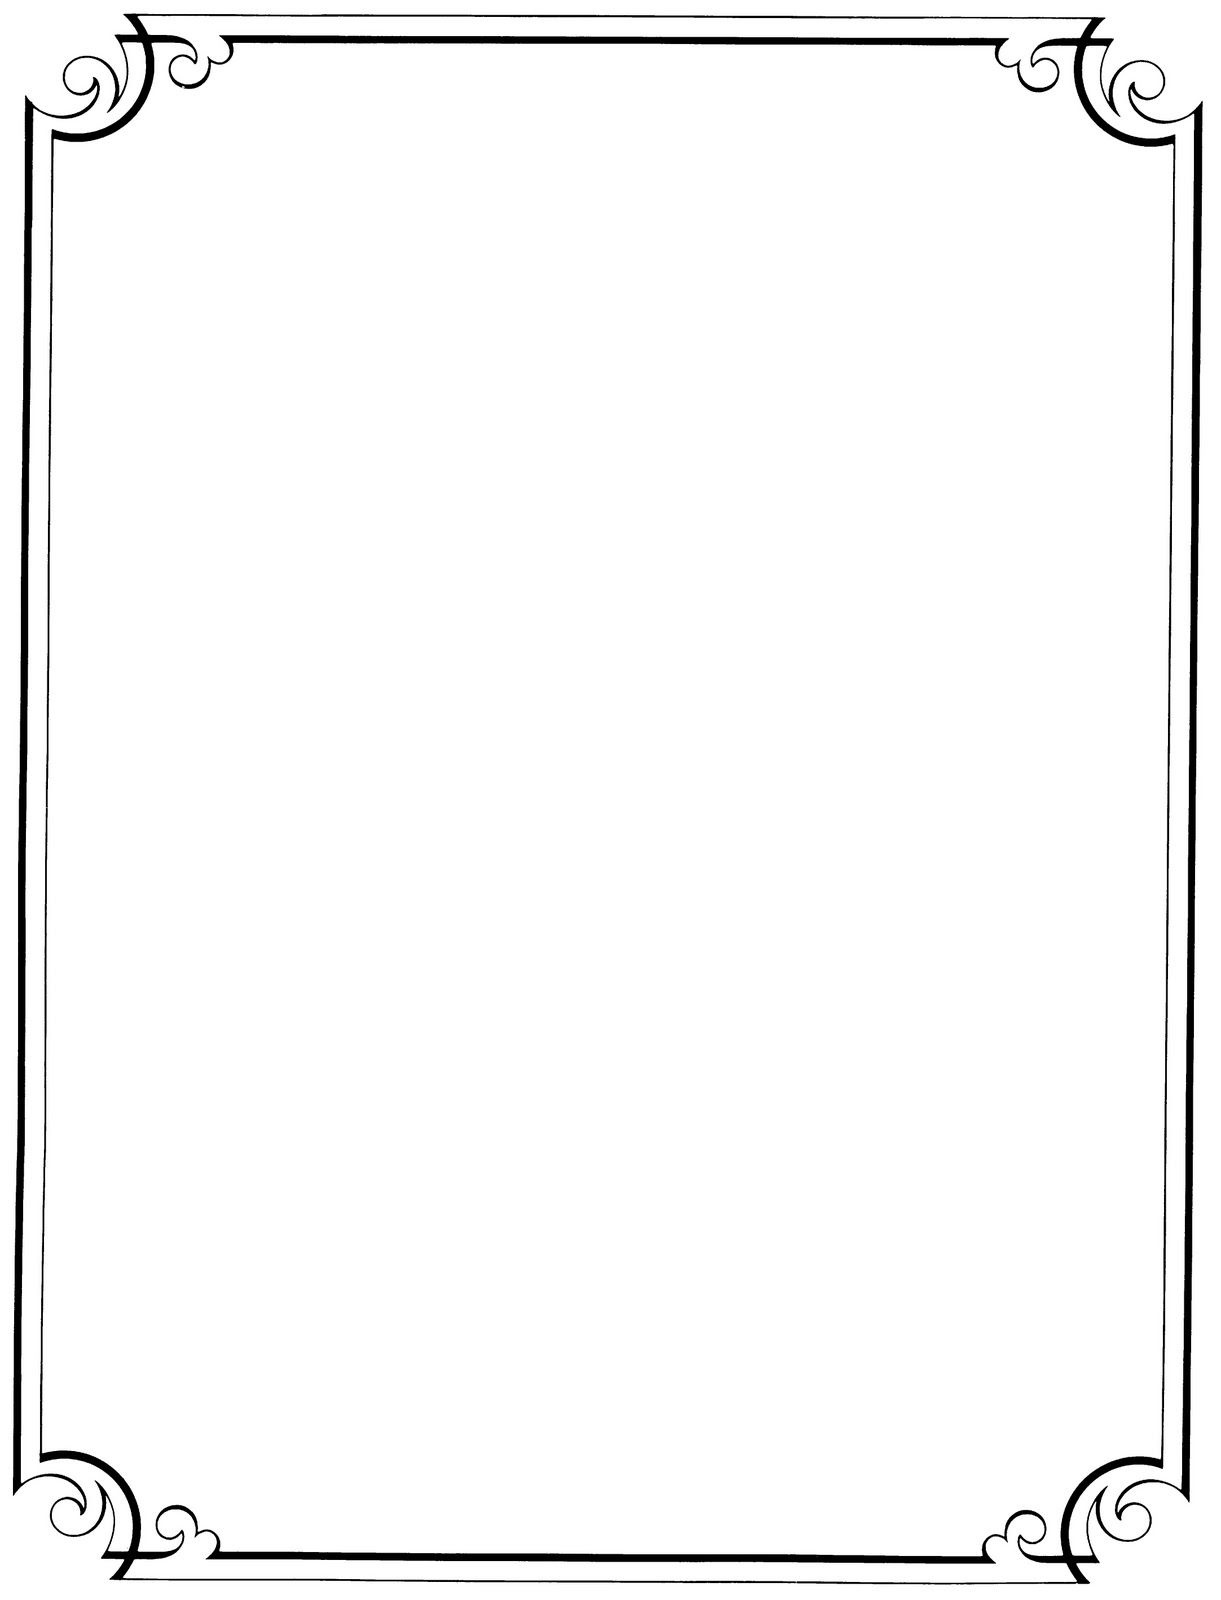 Free Printable Clip Art Borders    : Free Vintage Clip Art - Free Printable Stationary Borders